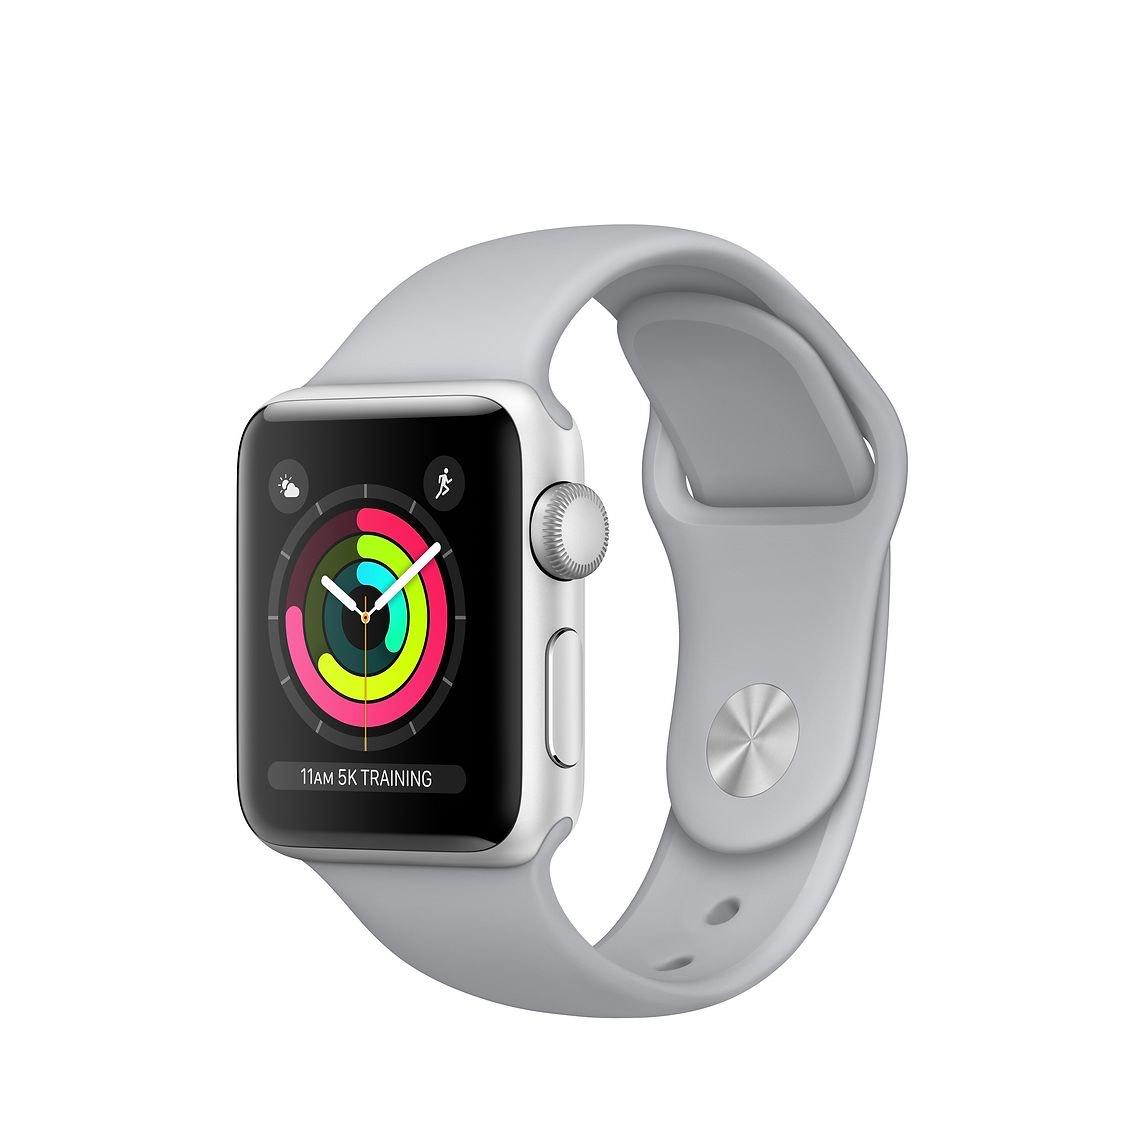 Apple Watch S3 42mm GPS - refurb - £189 @ Apple Store